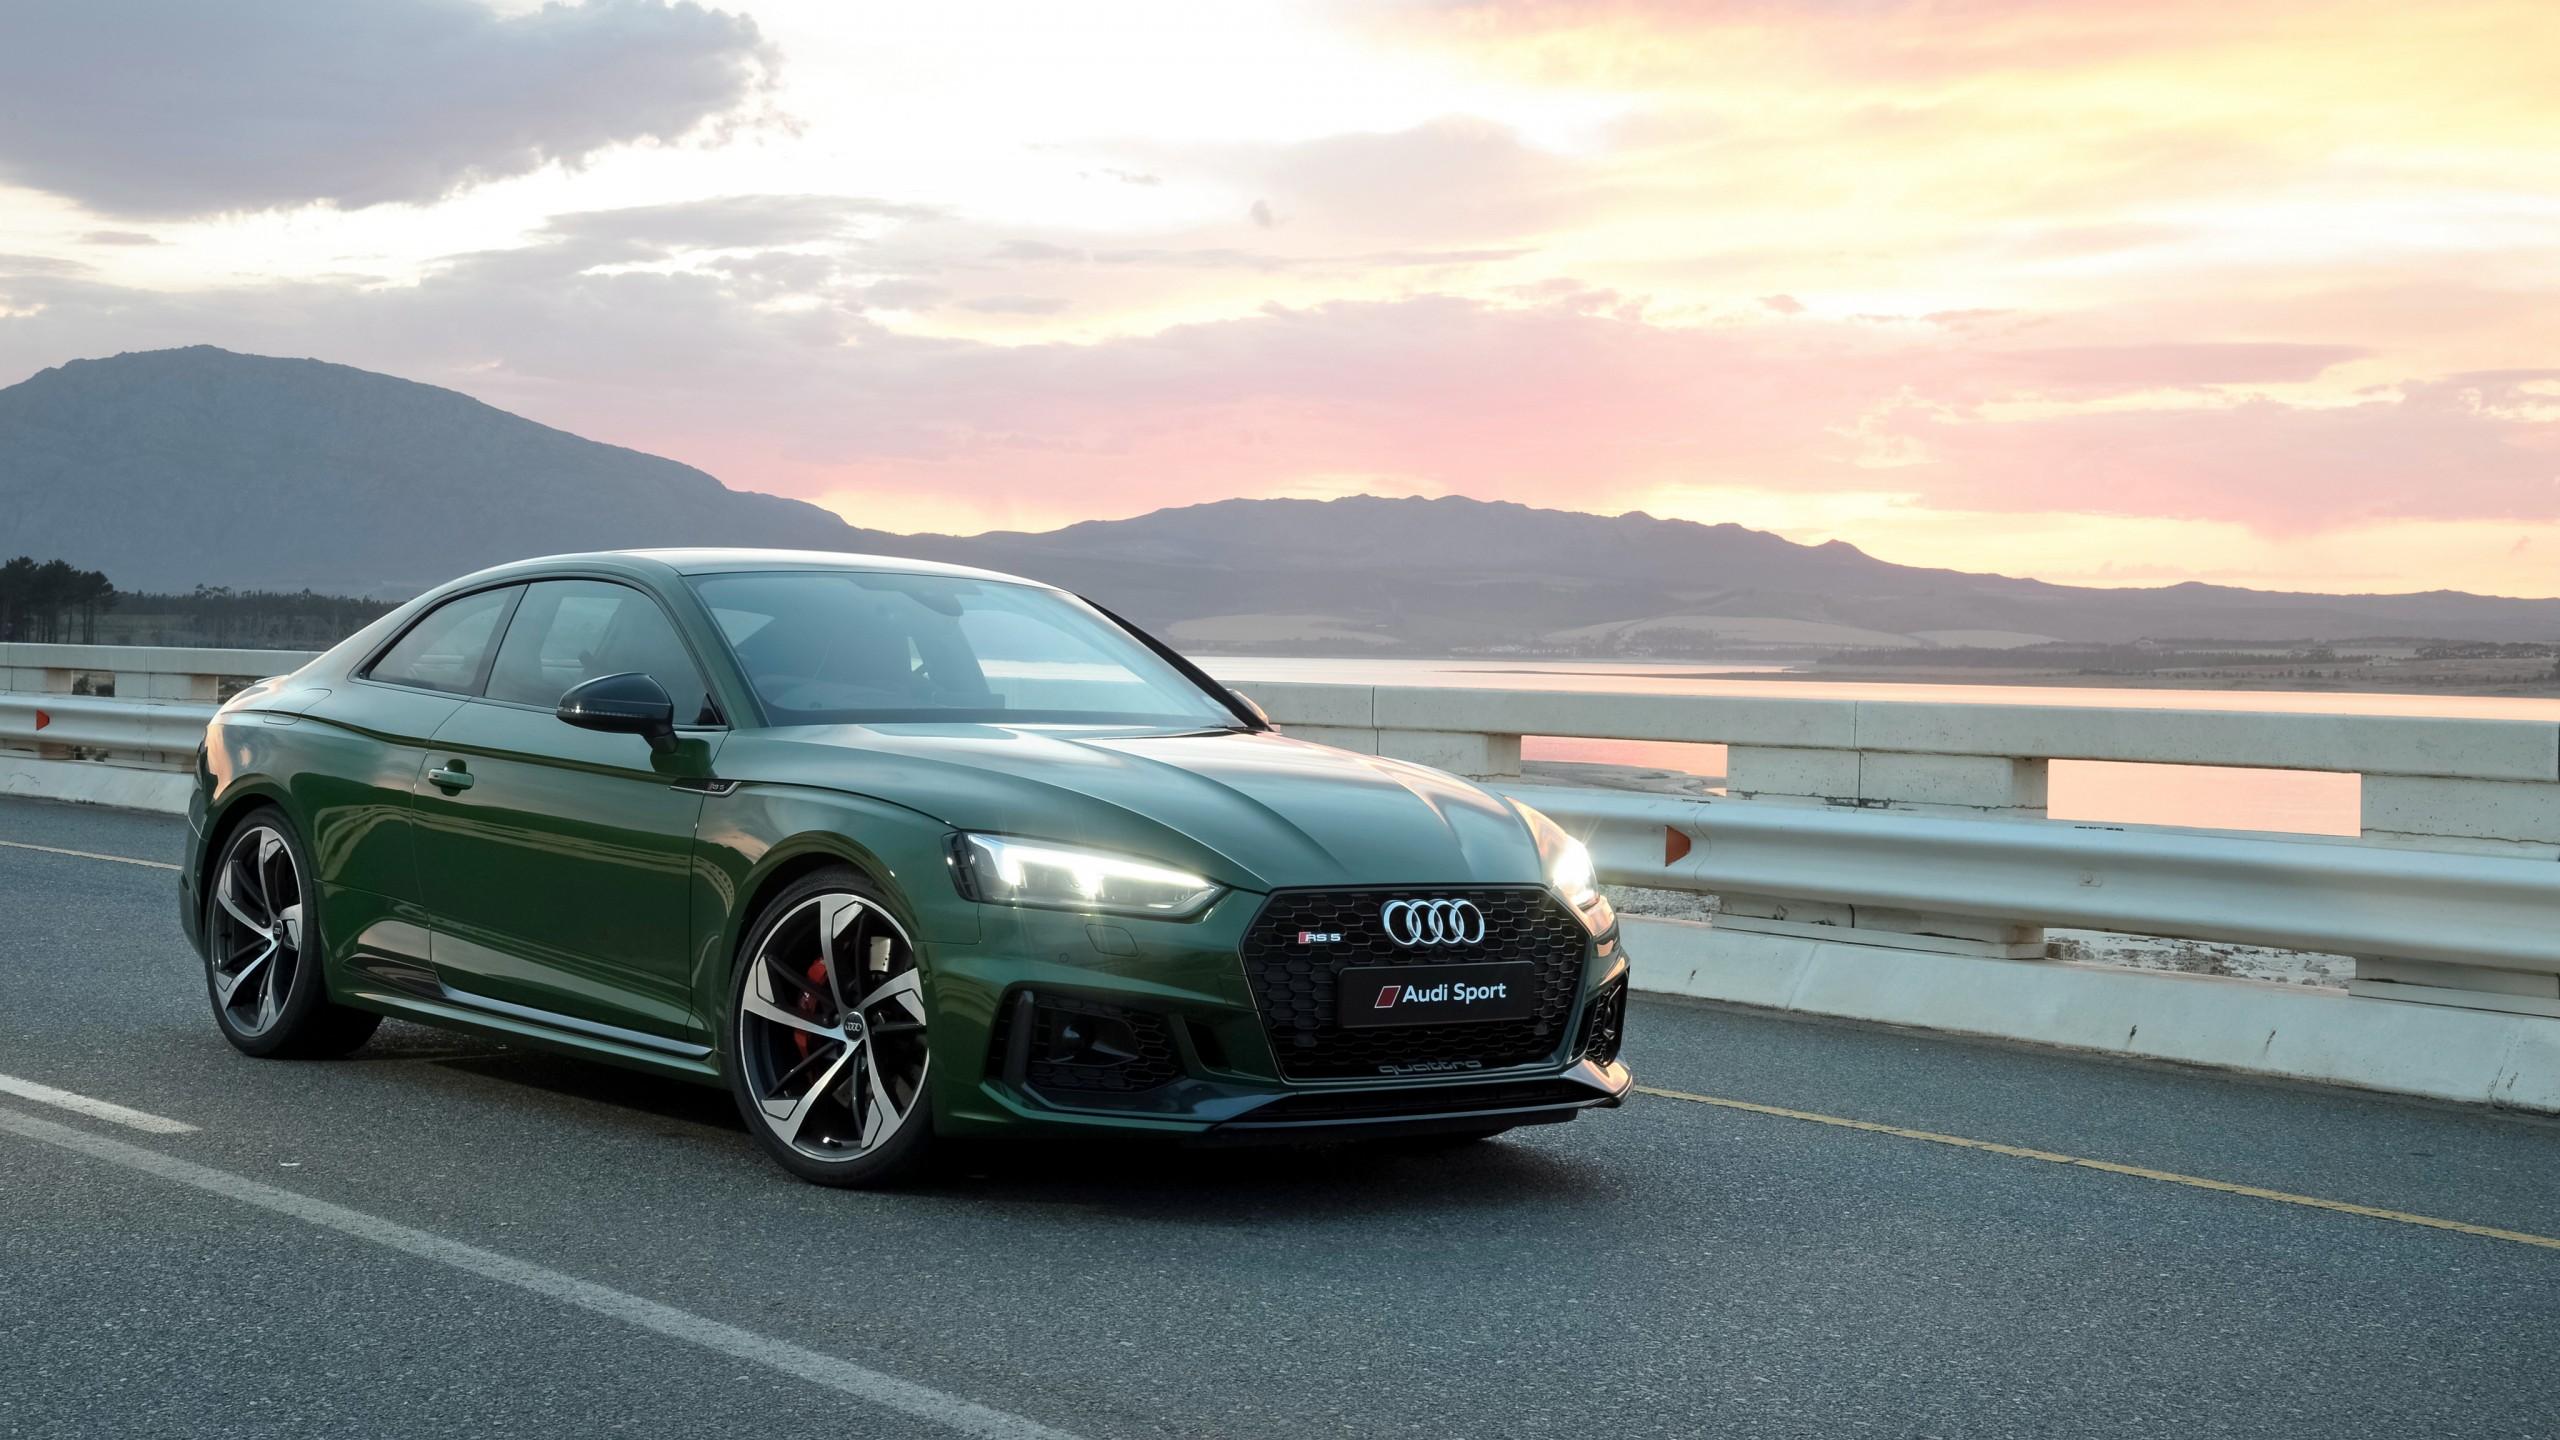 Audi Rs5 Sportback 4k 2019 Wallpapers: 2018 Audi RS5 Coupe 4K Wallpaper